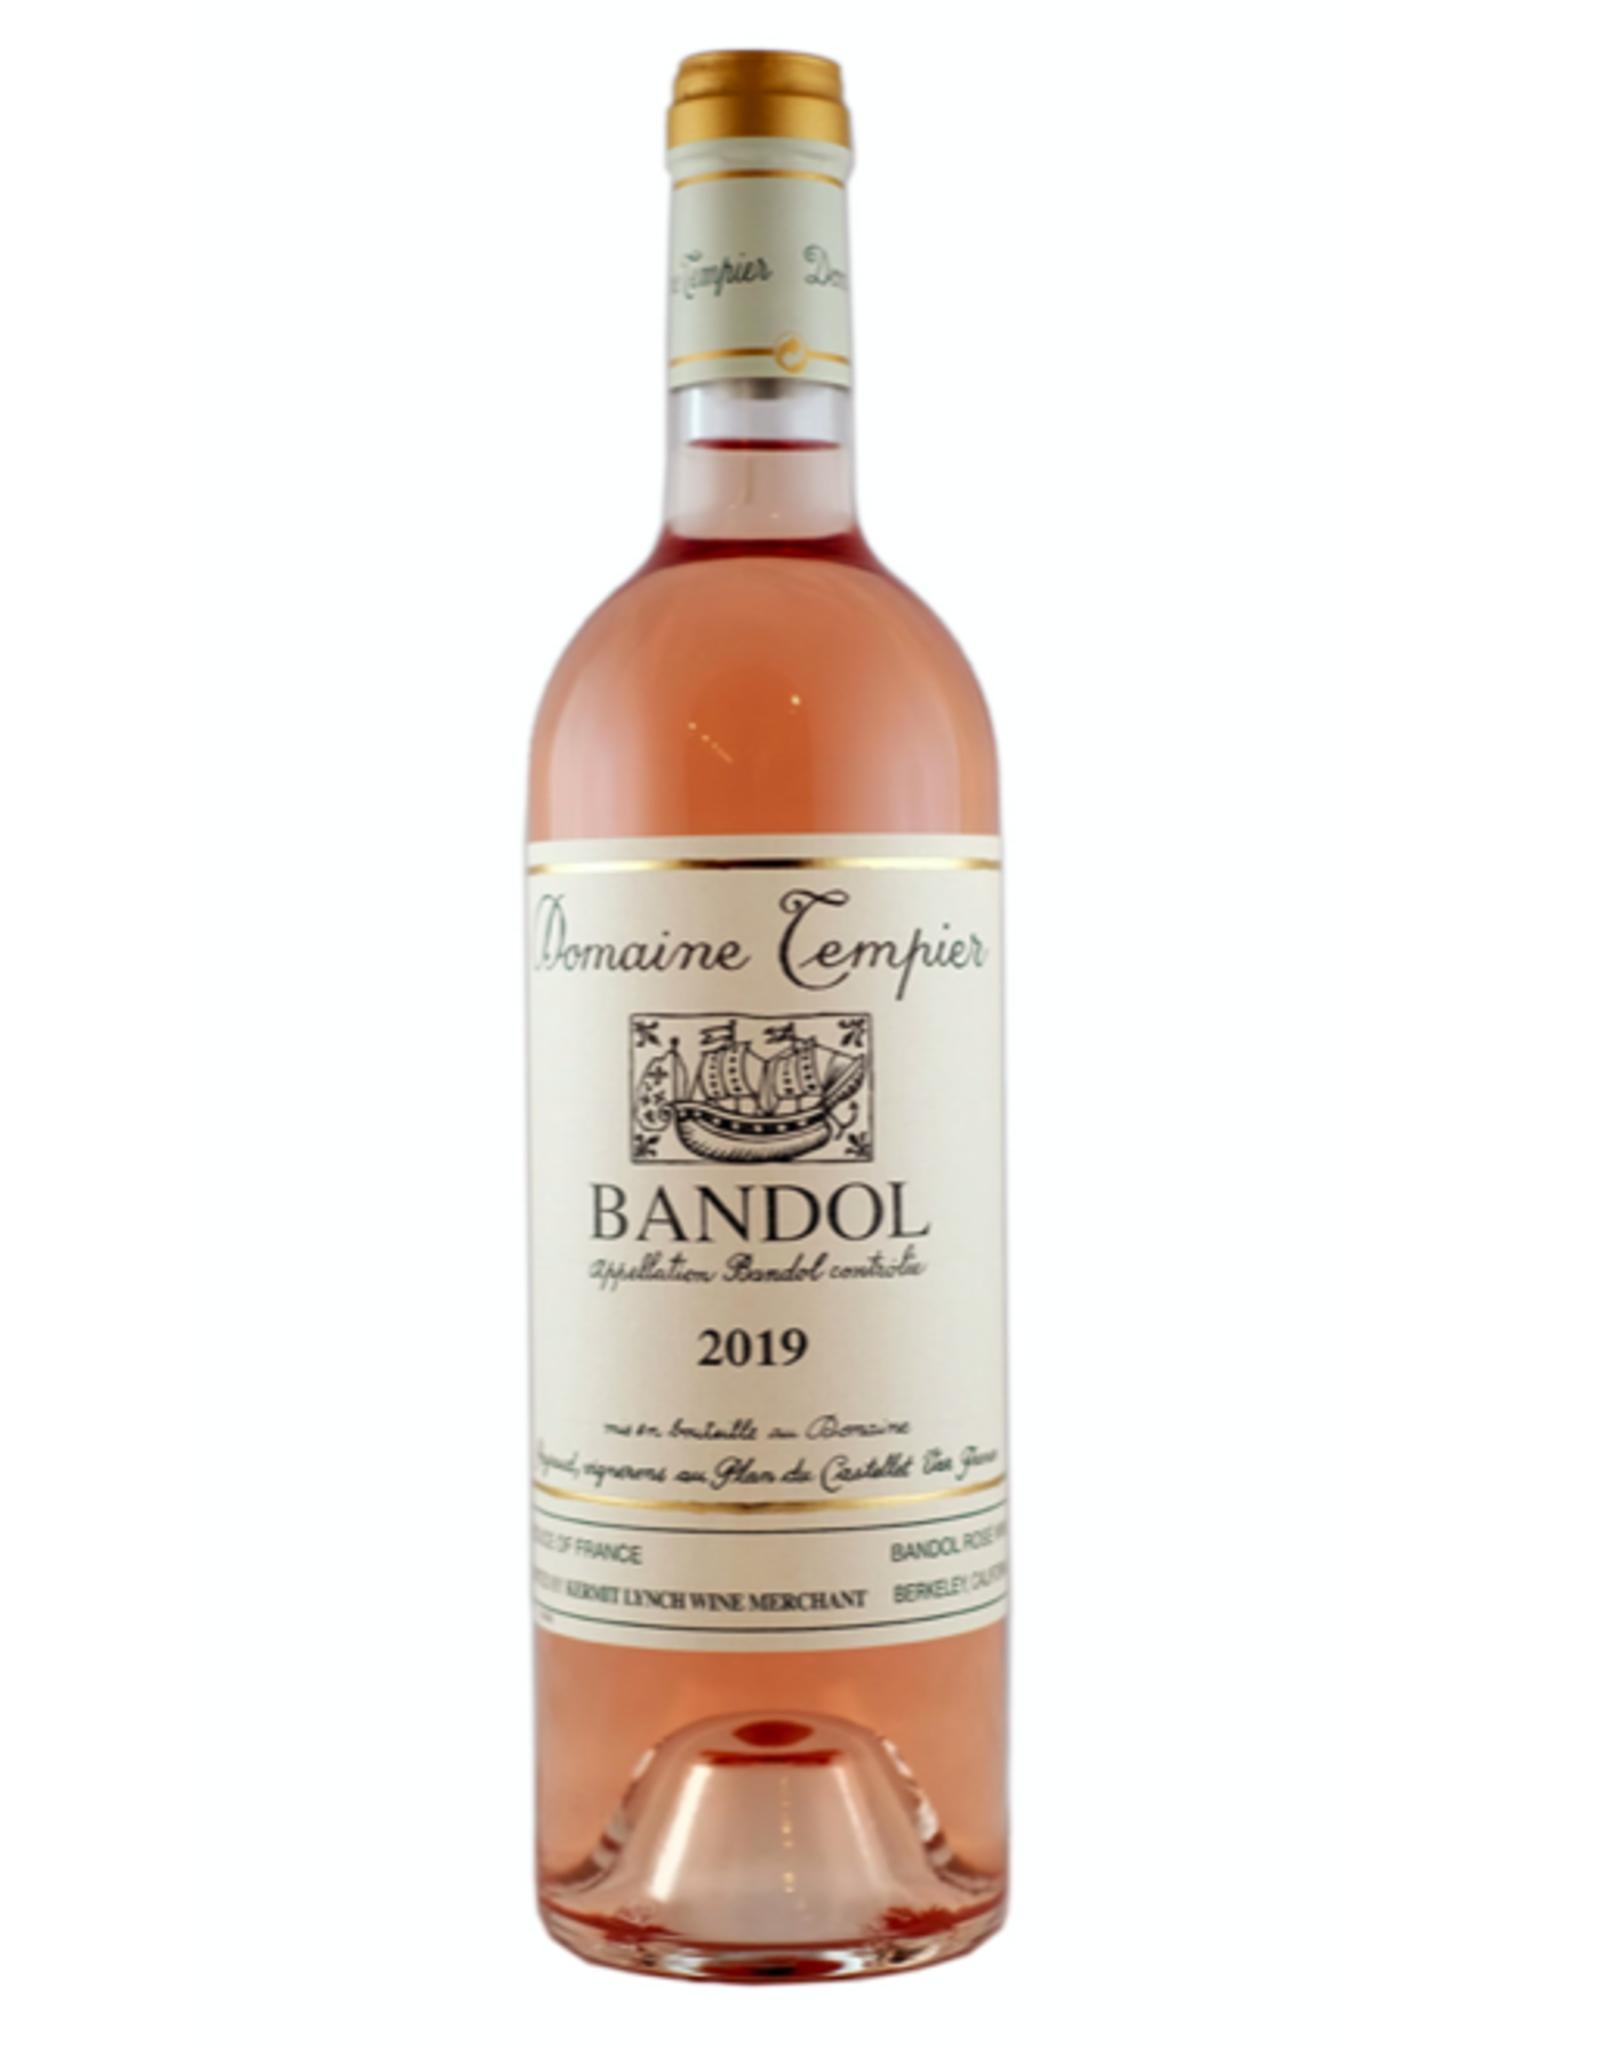 Domaine Tempier Bandol Rose 2019